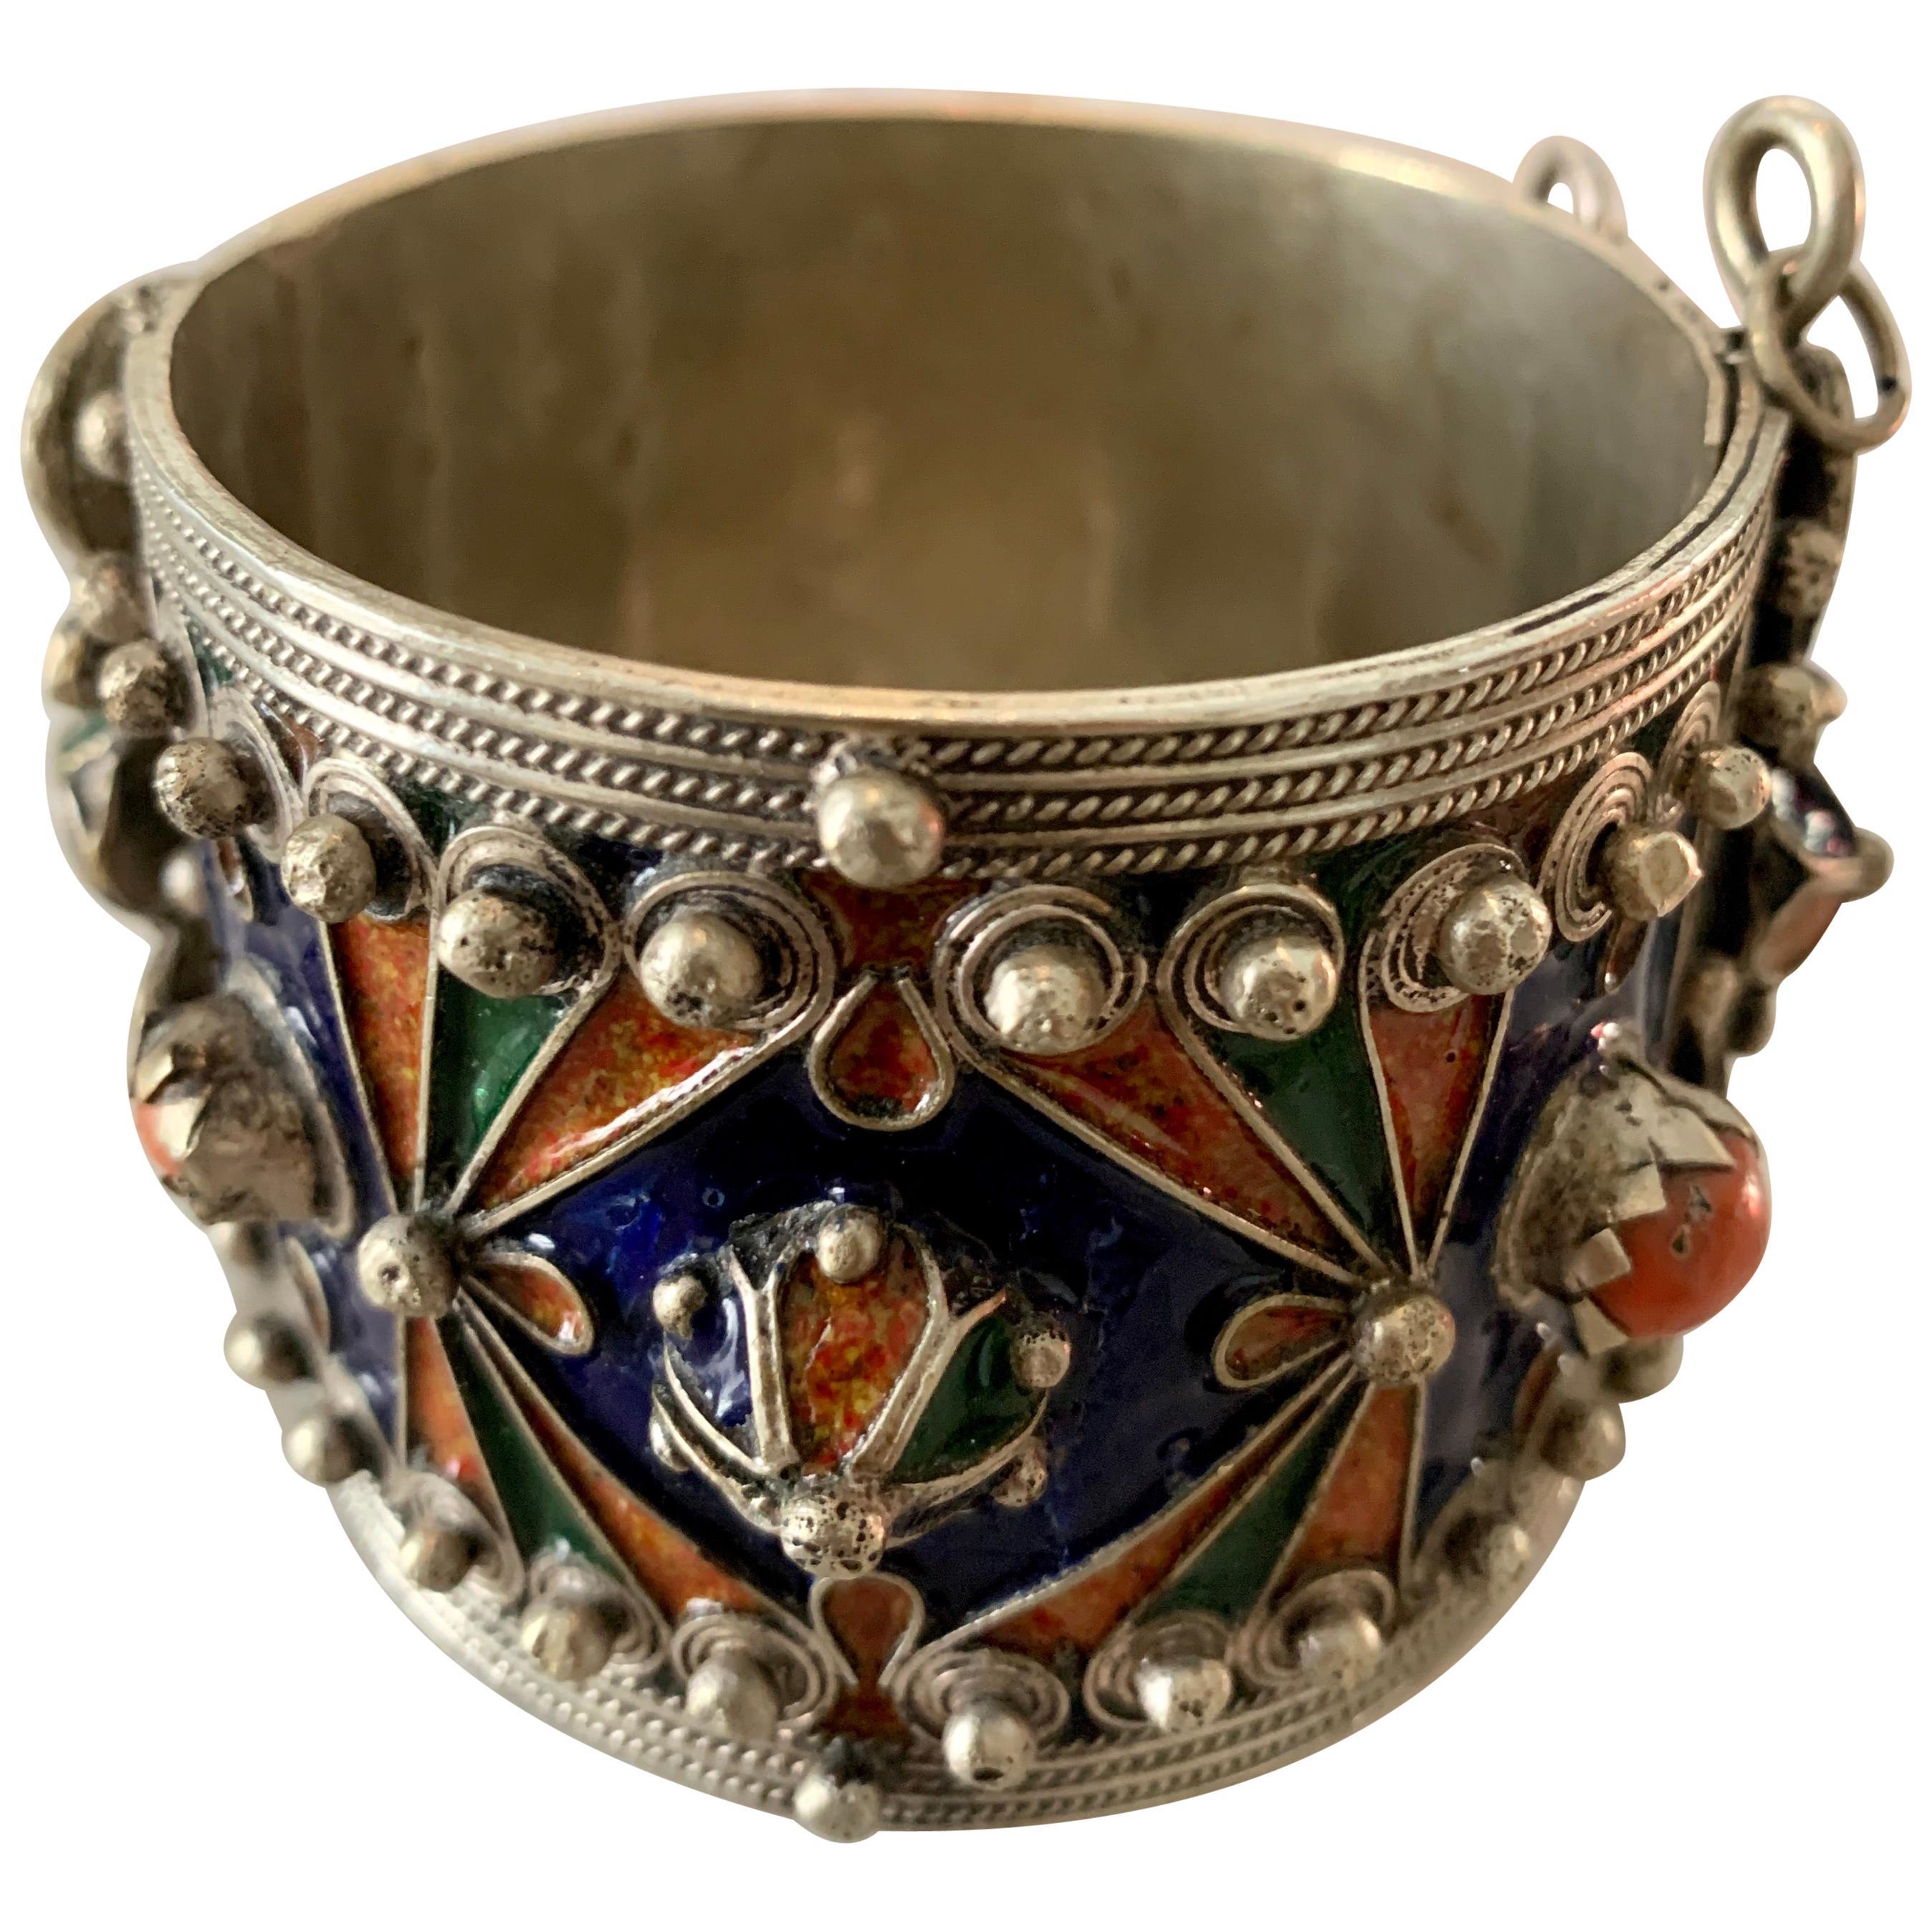 Handmade Silver and Enamel Bracelet Cuff